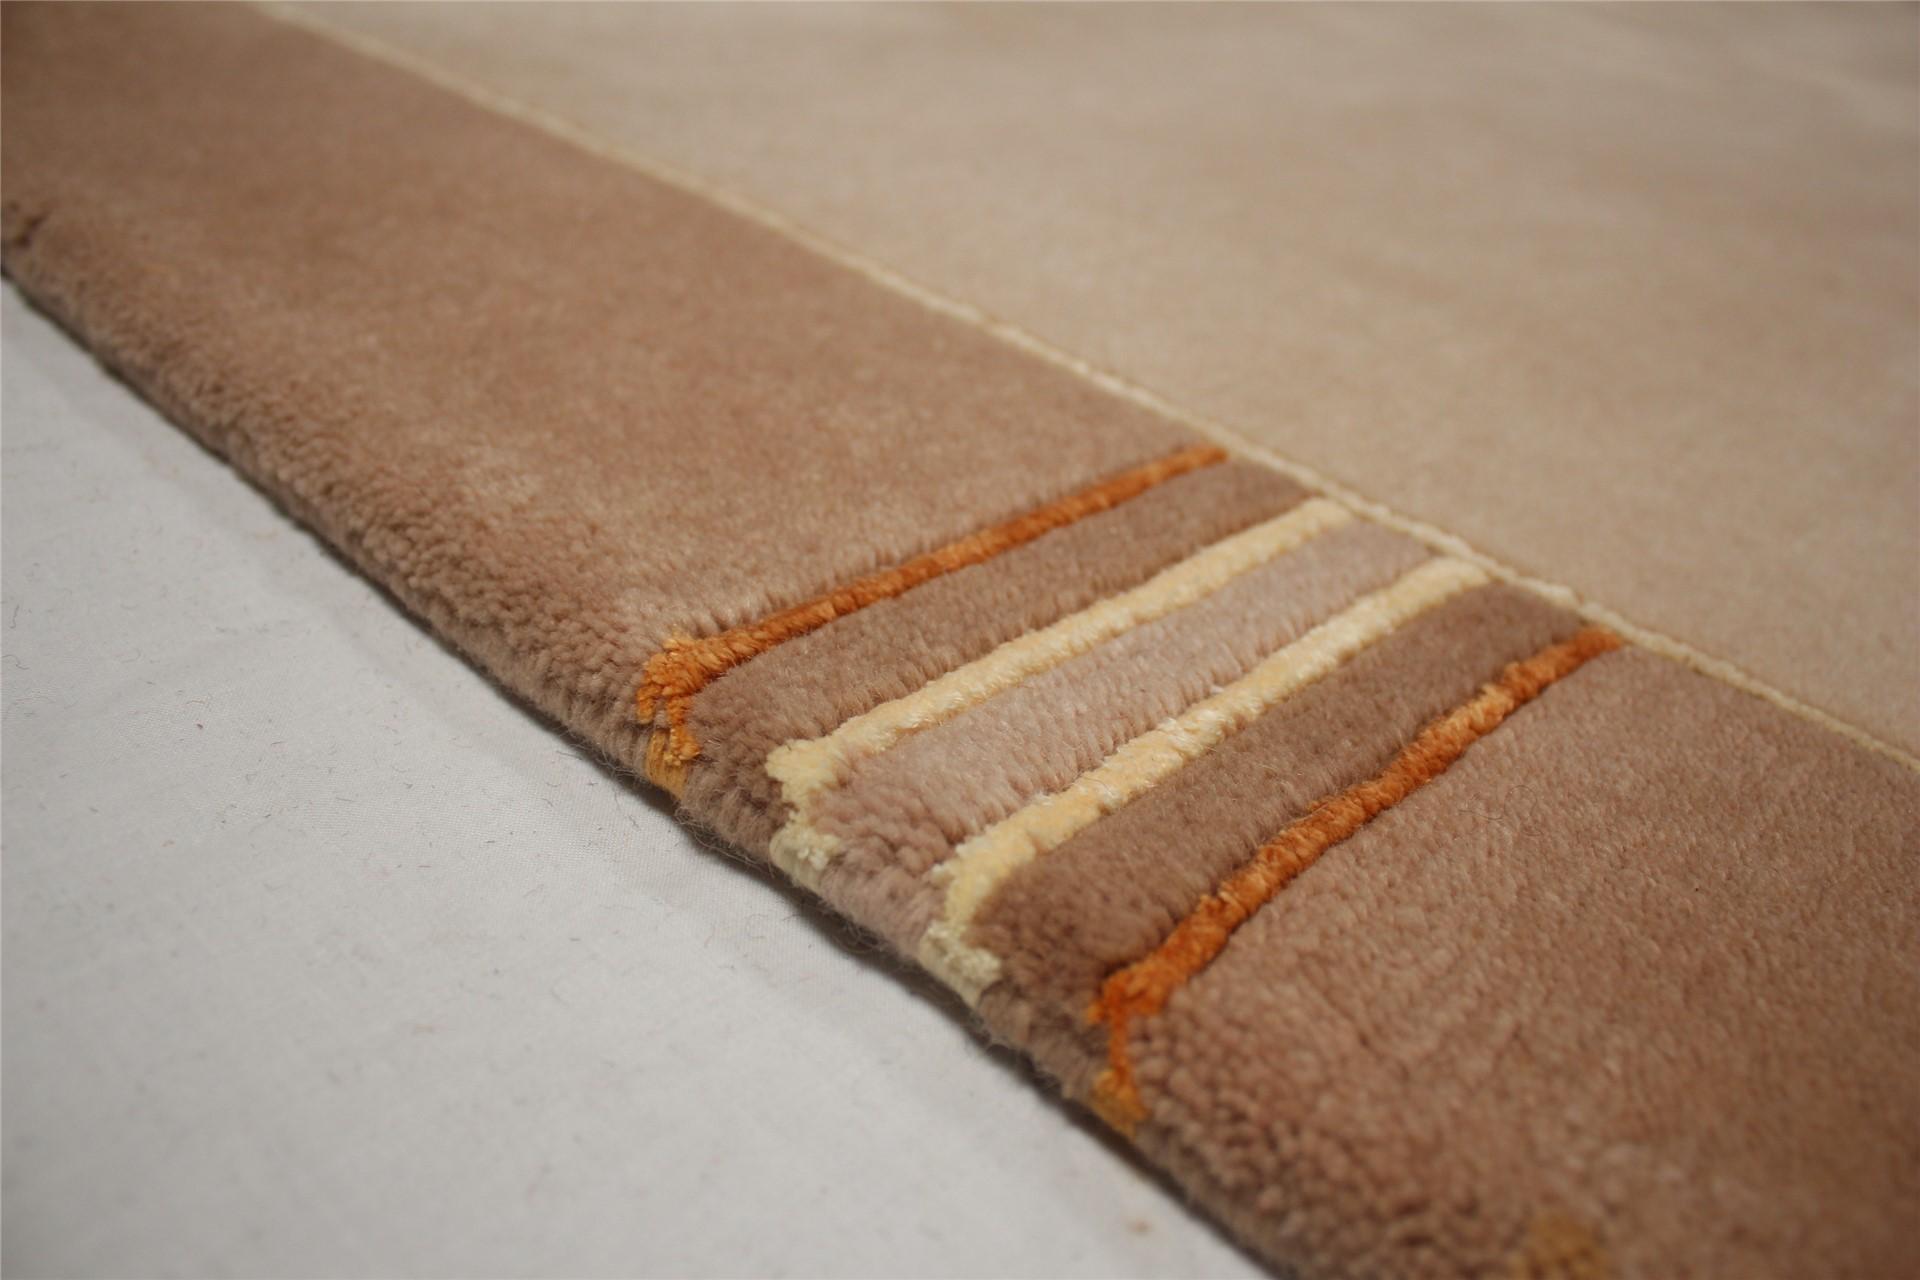 teppich original nepal handgekn pft mit seide 170x240 cm. Black Bedroom Furniture Sets. Home Design Ideas